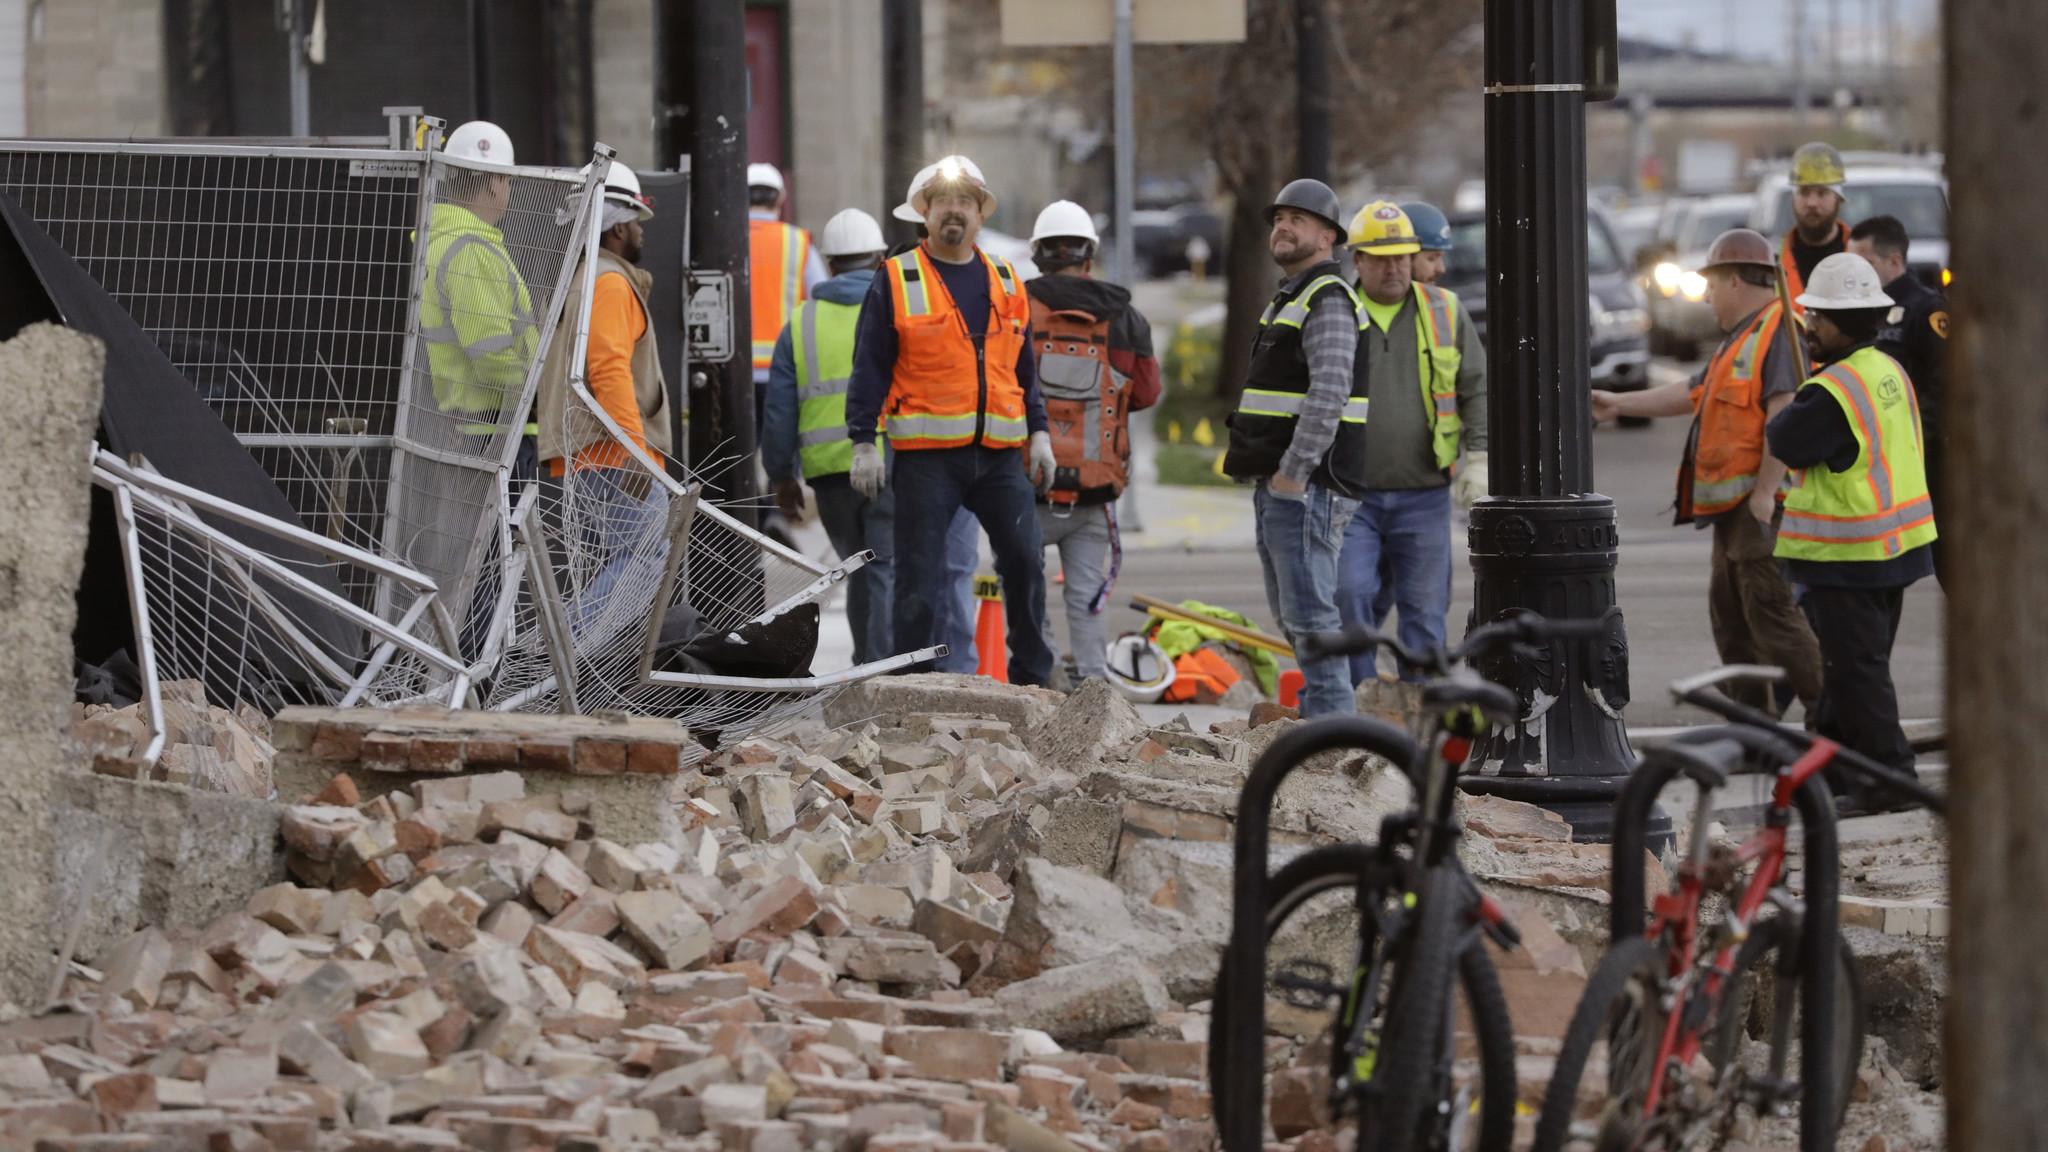 5.7 magnitude quake hits Utah, knocking out power, airport service and coronavirus hotline